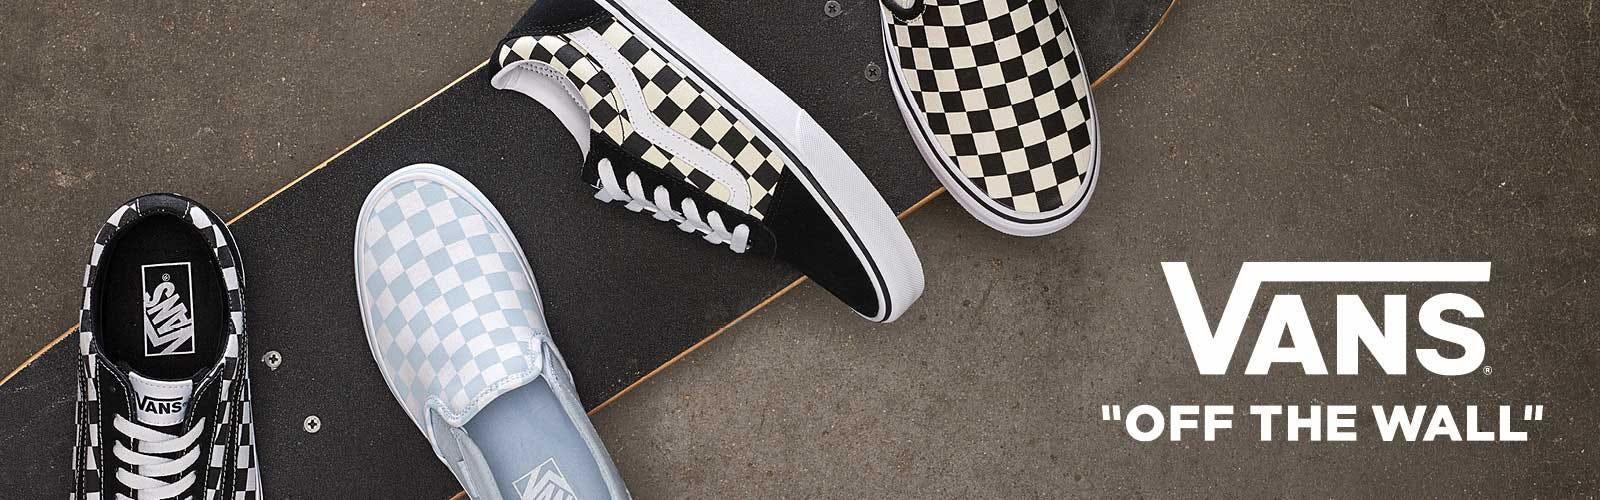 f0a9431c8c2e Vans - Canvas